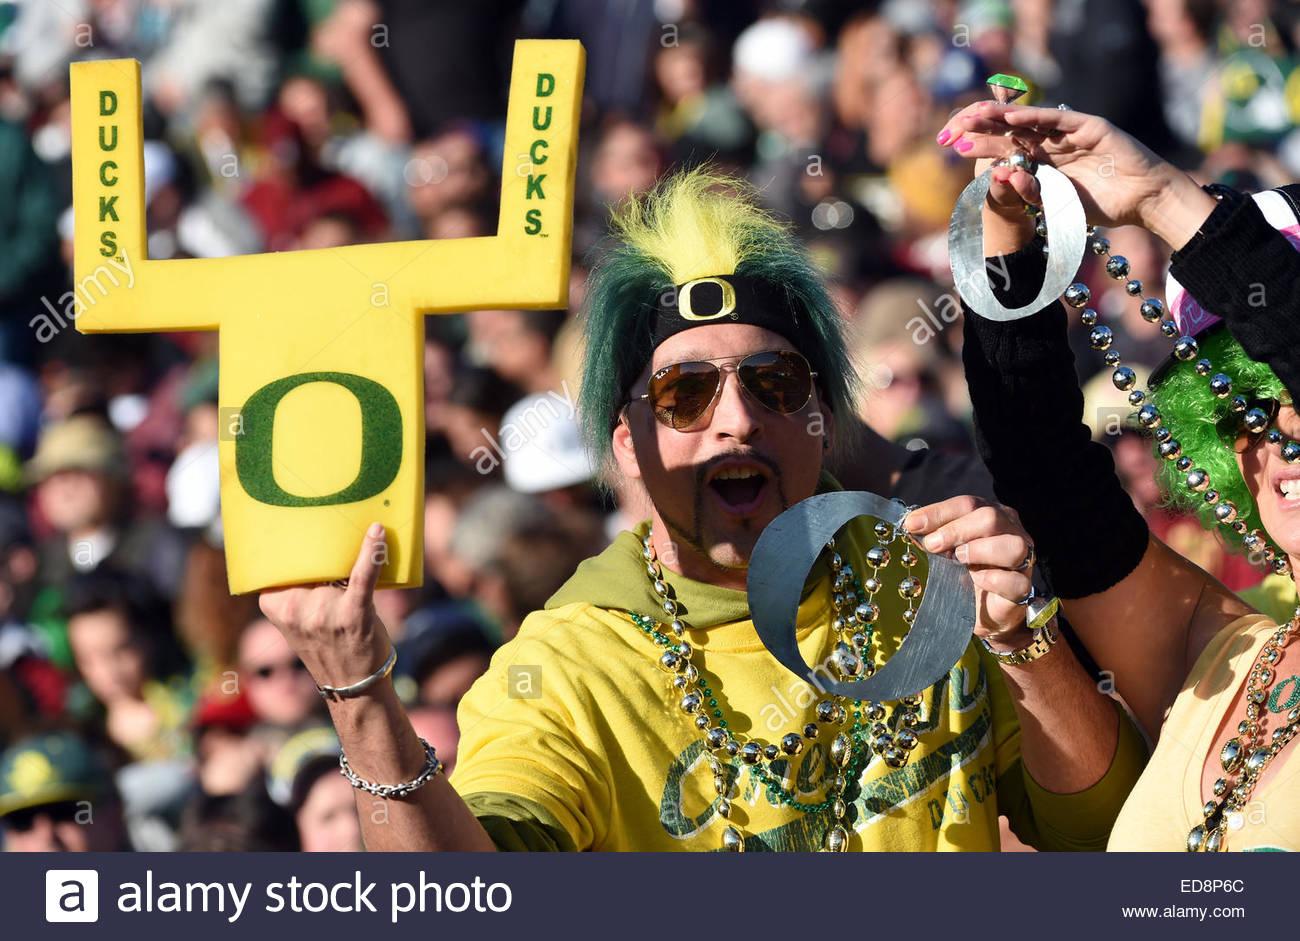 Pasadena, California, USA. 01st Jan, 2015. Oregon Ducks fans react after a touchdown against Florida State Seminoles - Stock Image